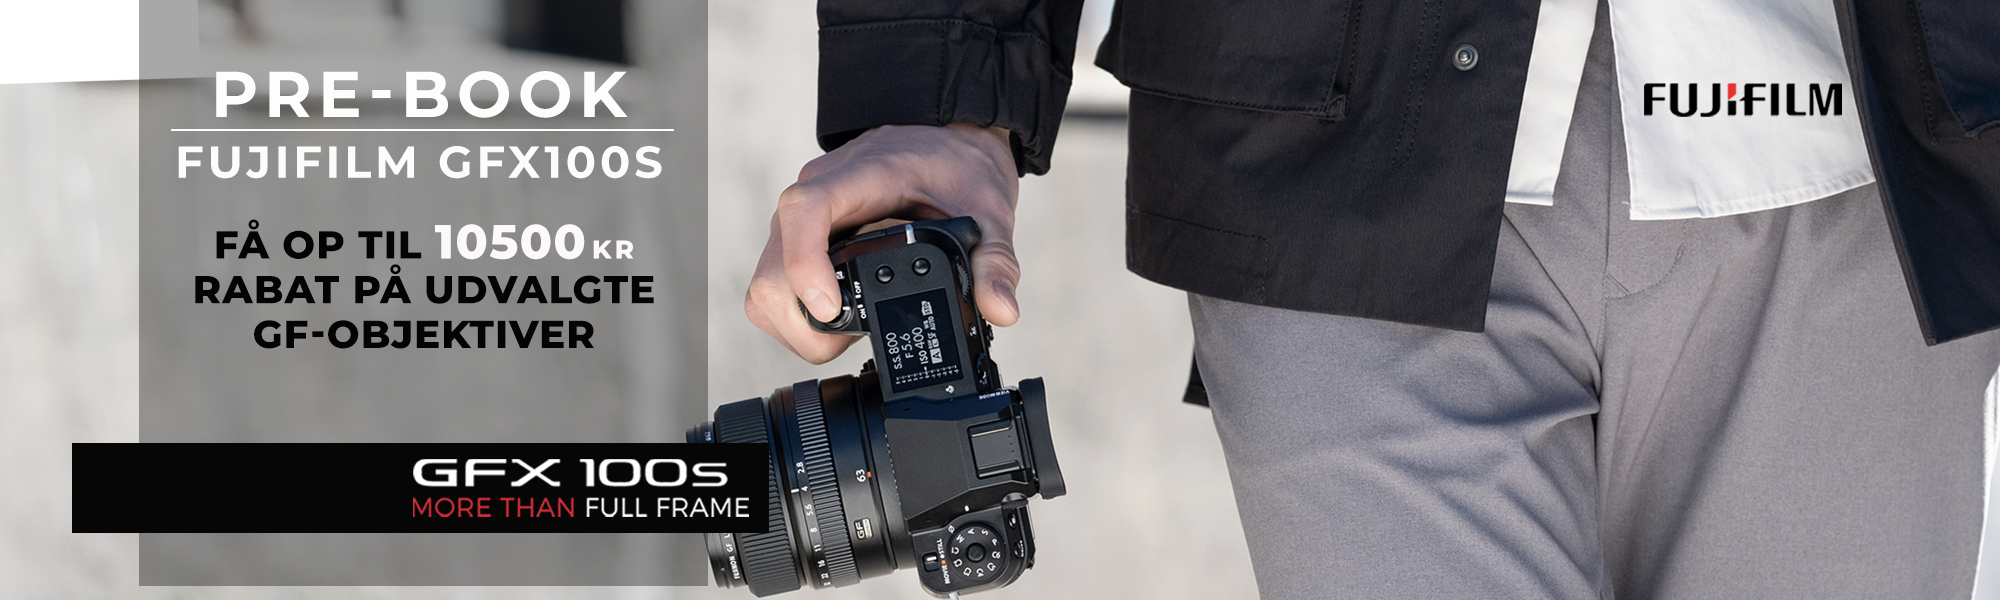 Fujifilm 50mm f1